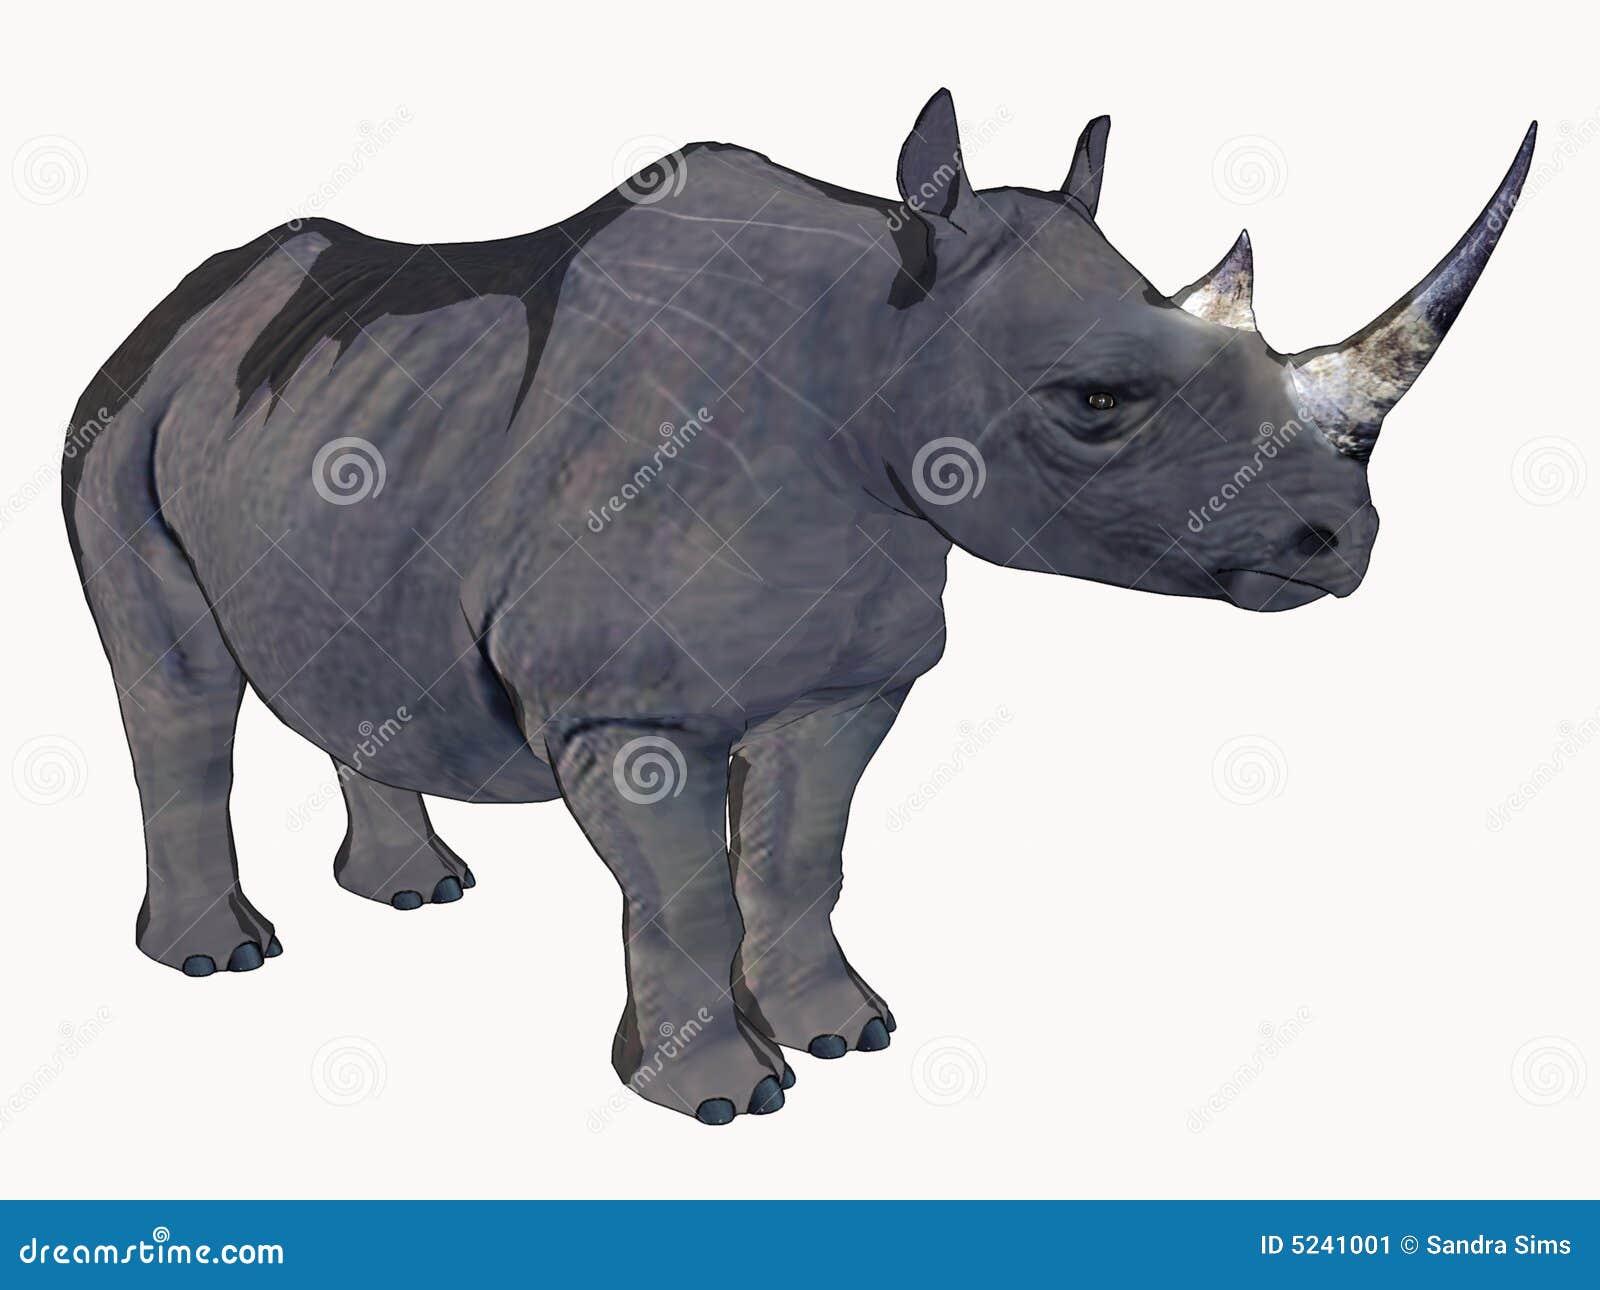 Cartoon rhino computer generated 3 dimensional image